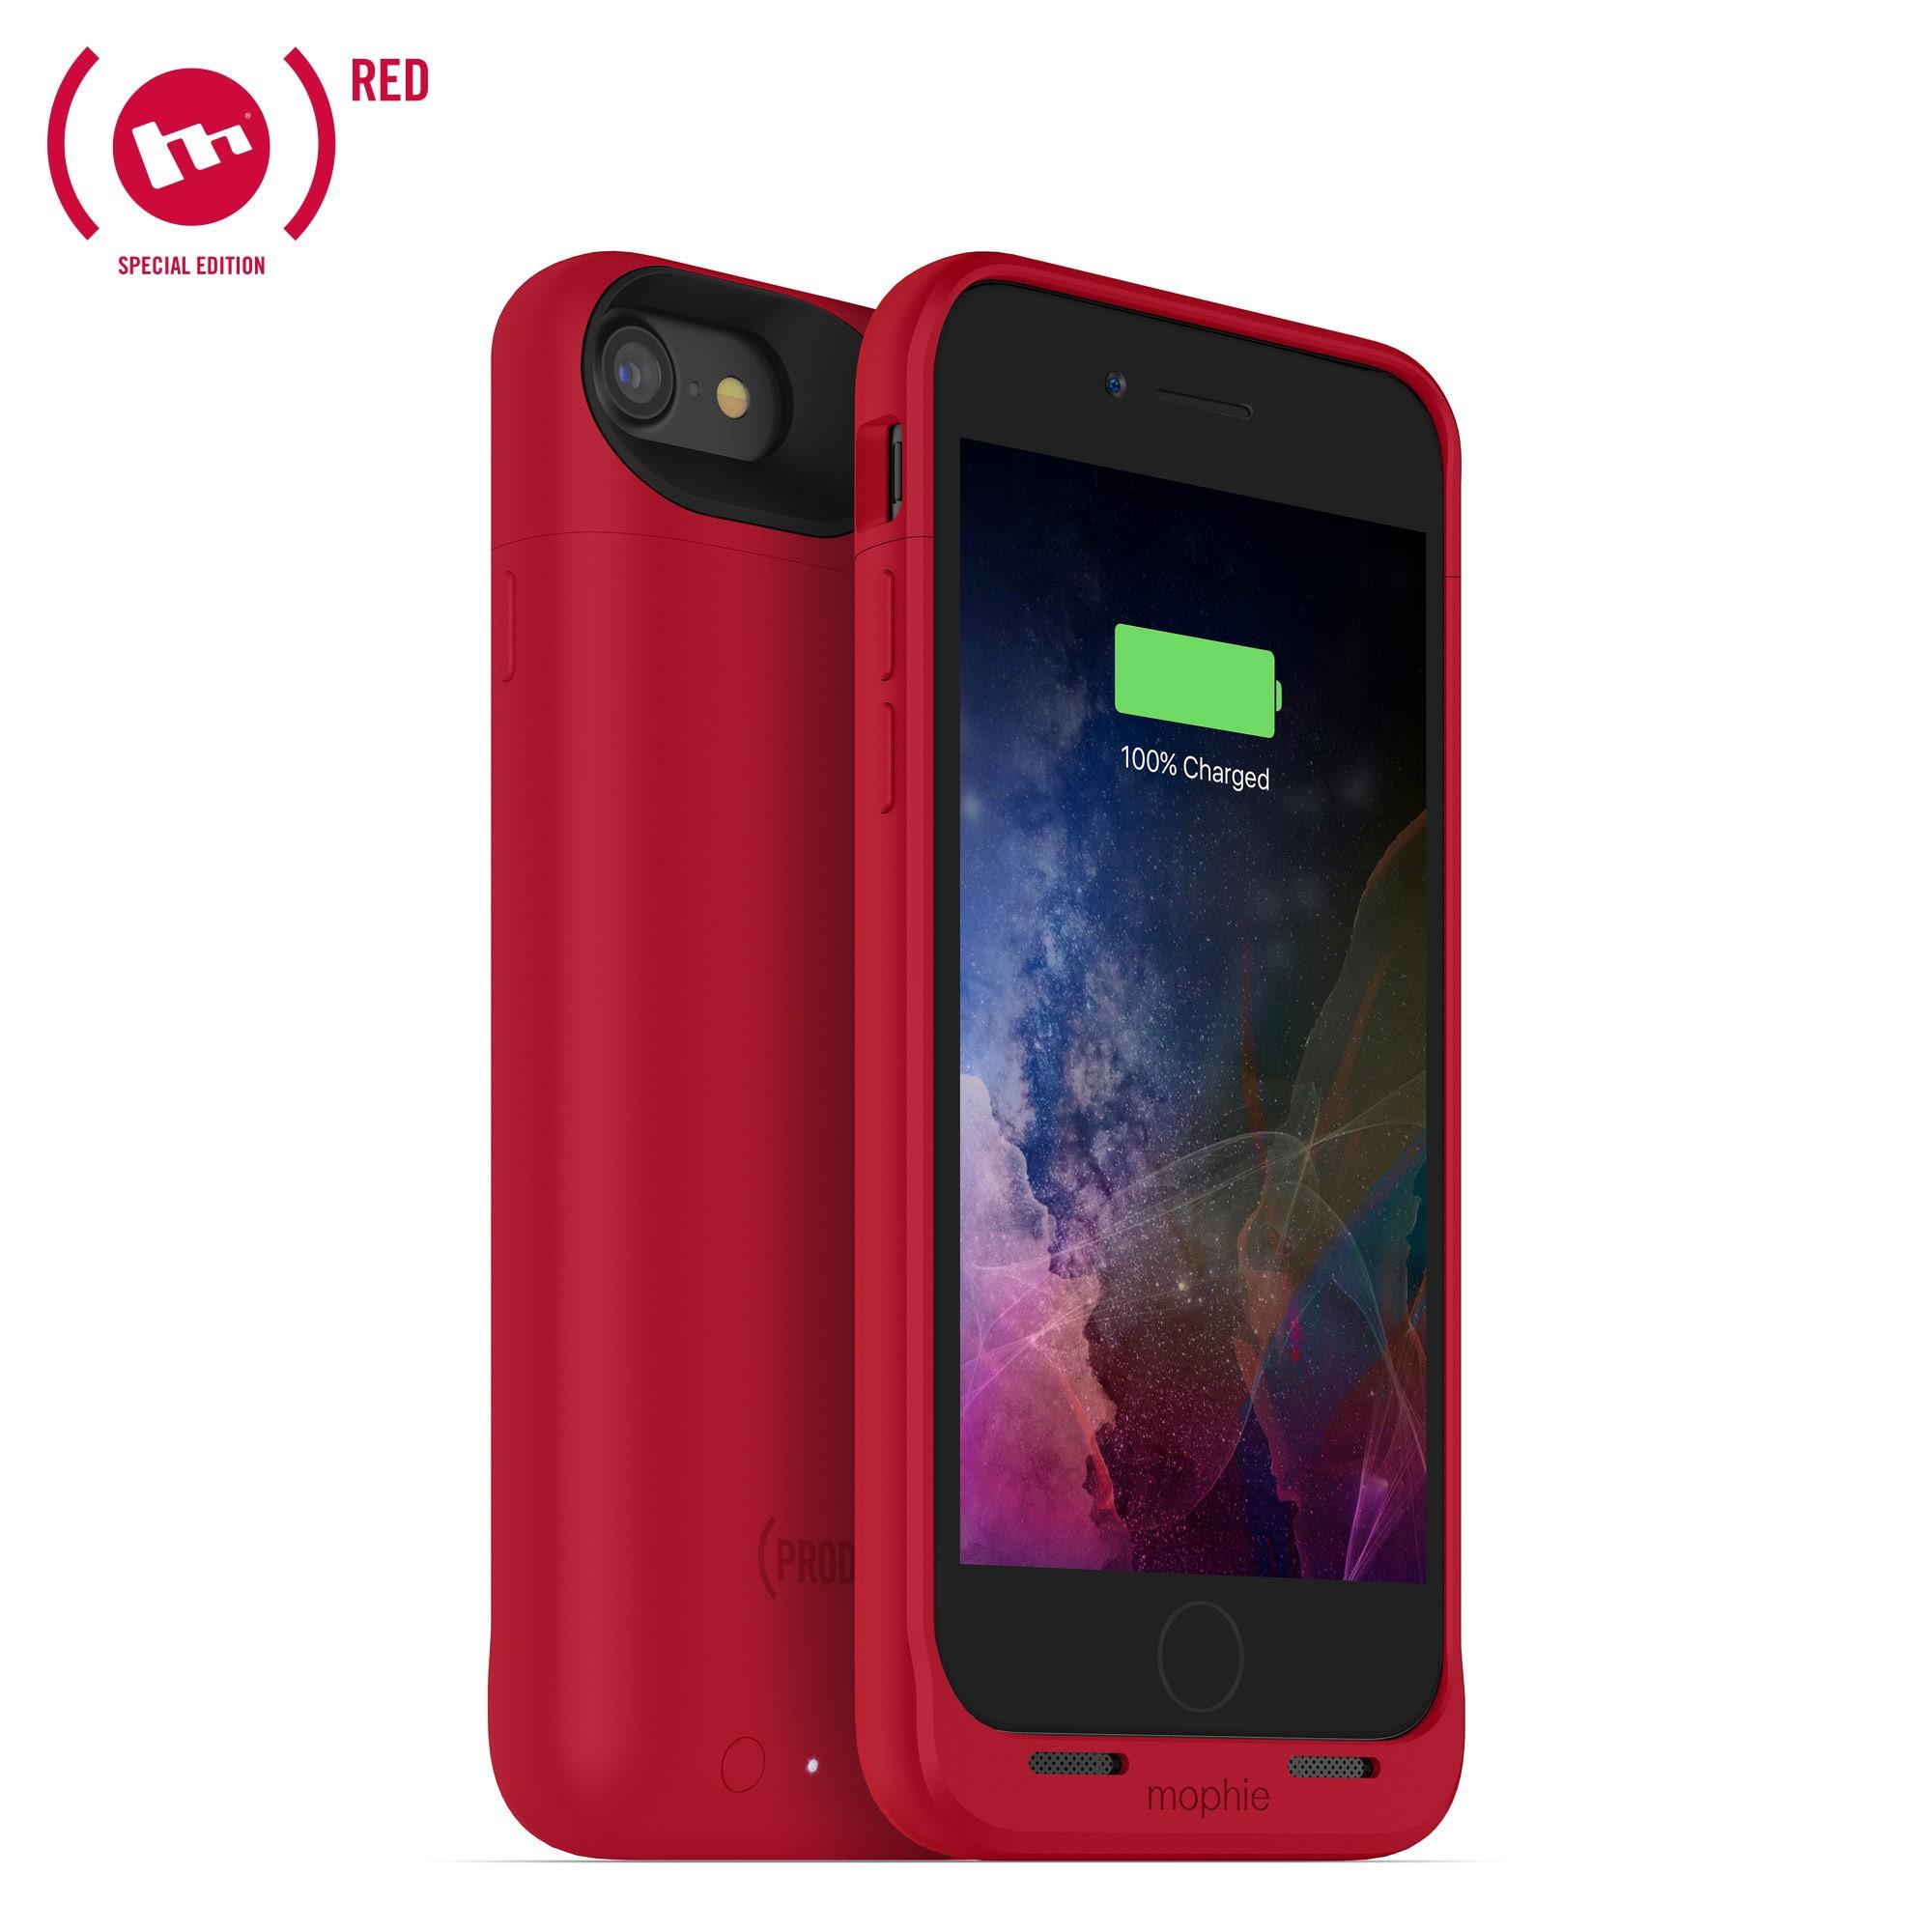 Nabíjecí pouzdro pro Apple iPhone 7 - Mophie, Juice Pack Air 2525mAh Red